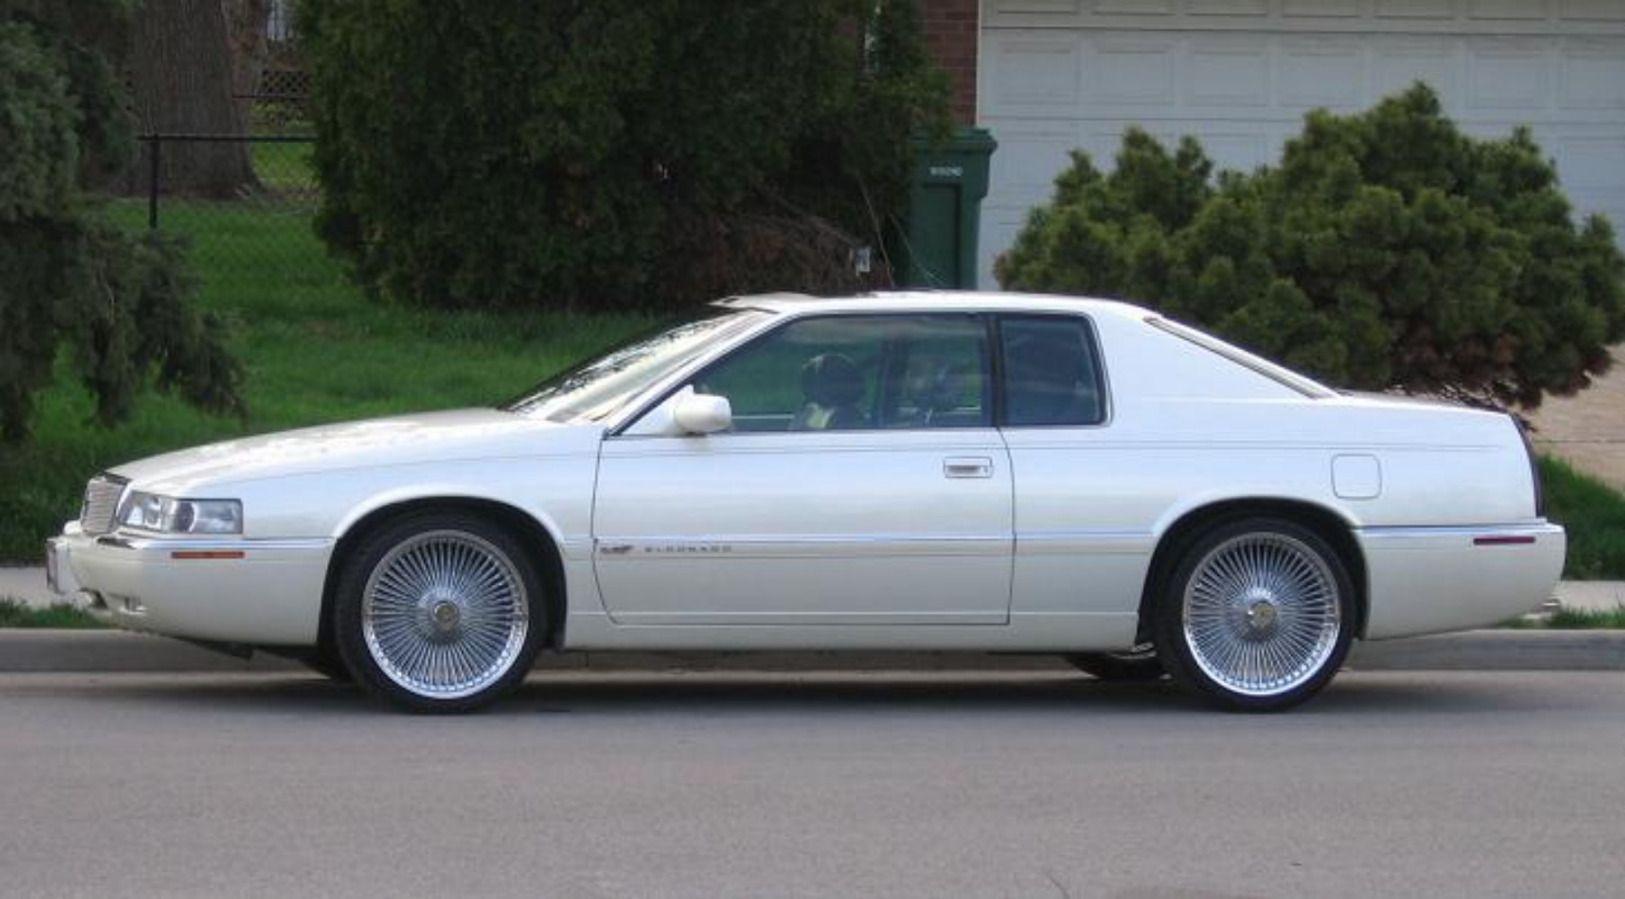 gizmo carroll s 1996 cadillac eldorado on wheelwell gizmo carroll s 1996 cadillac eldorado